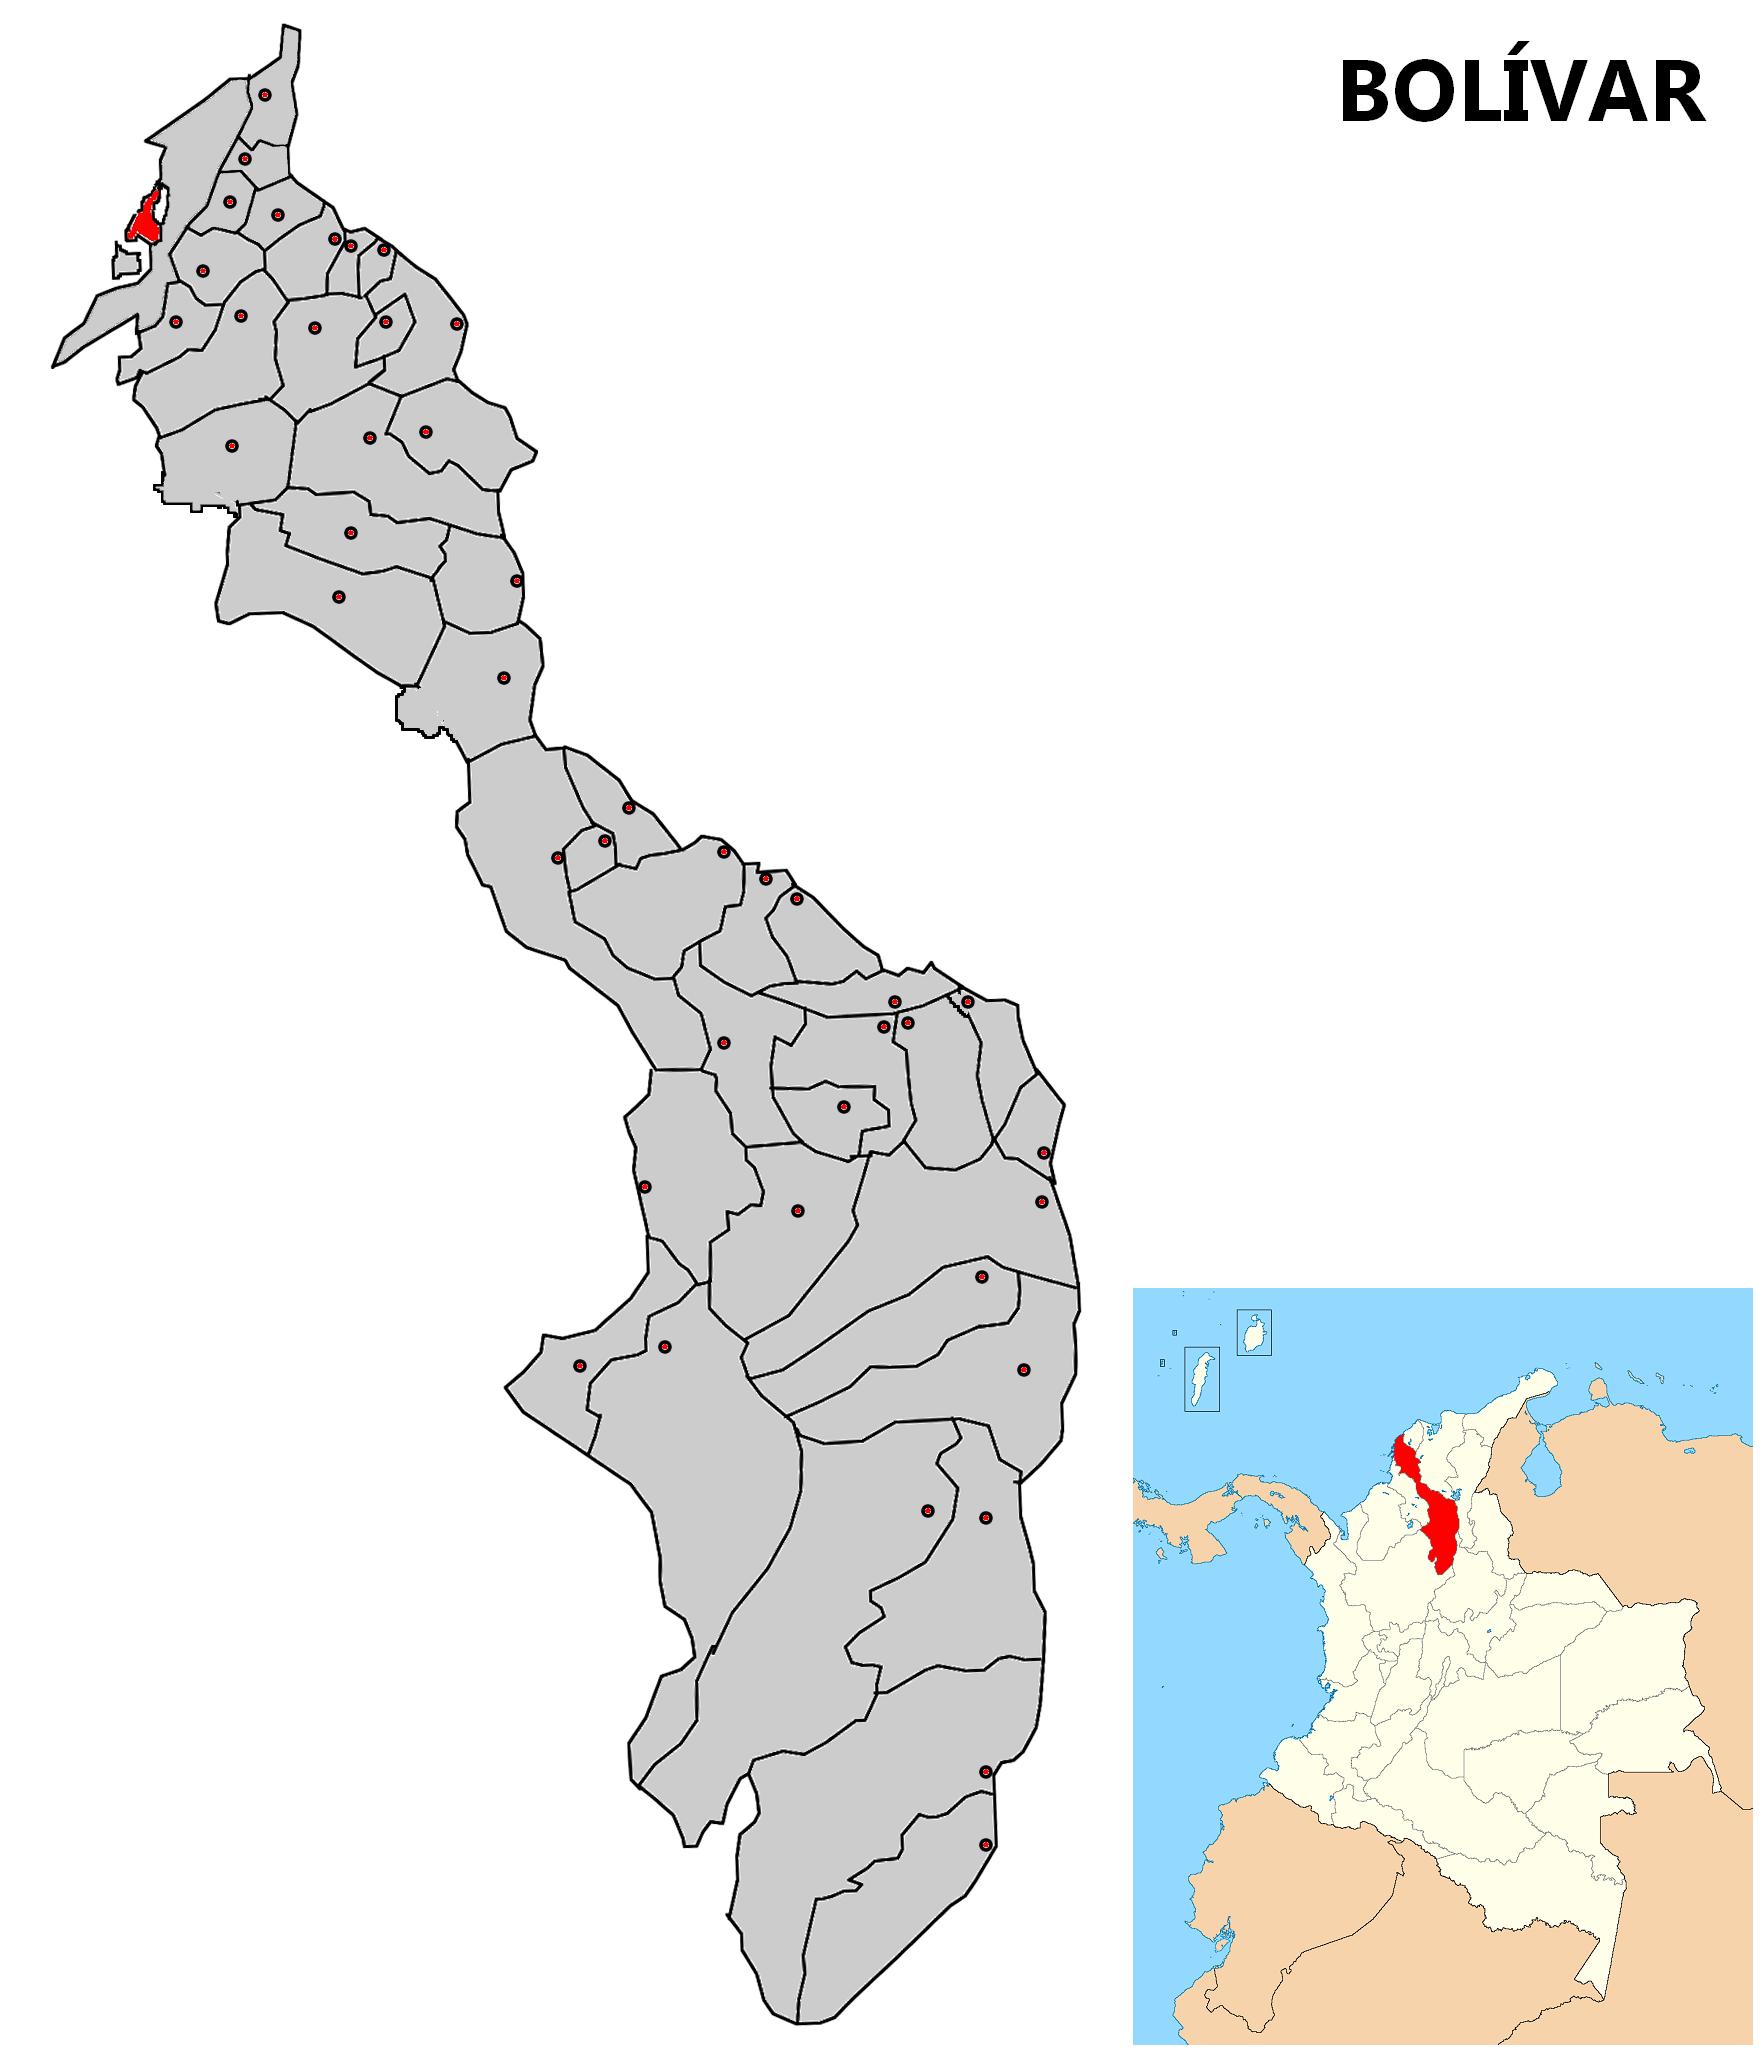 http://upload.wikimedia.org/wikipedia/commons/5/5e/MunsBolivar.png